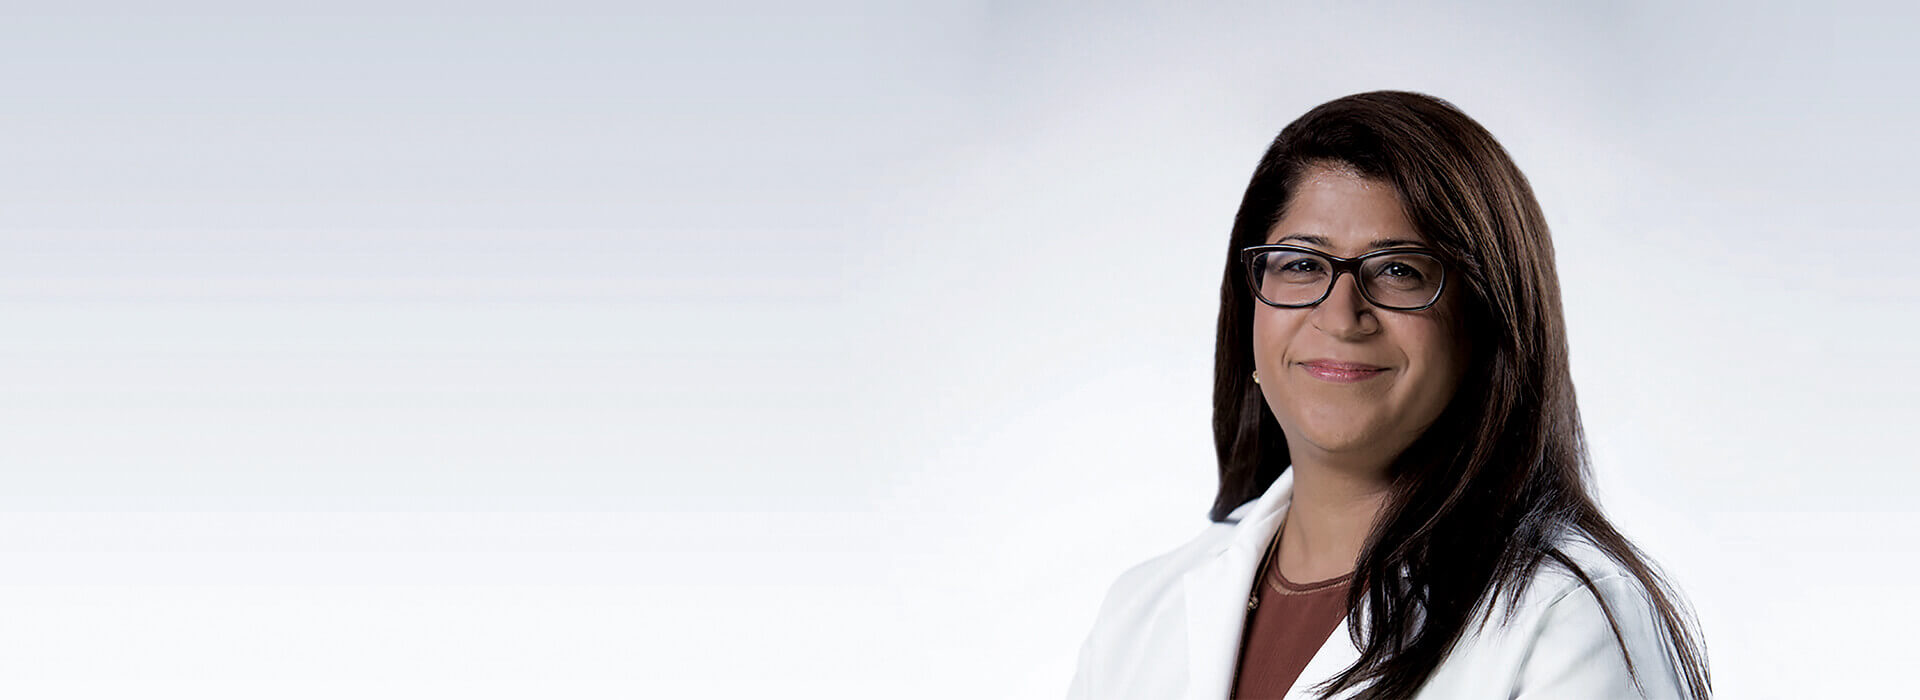 Neda Chelehmalzadeh